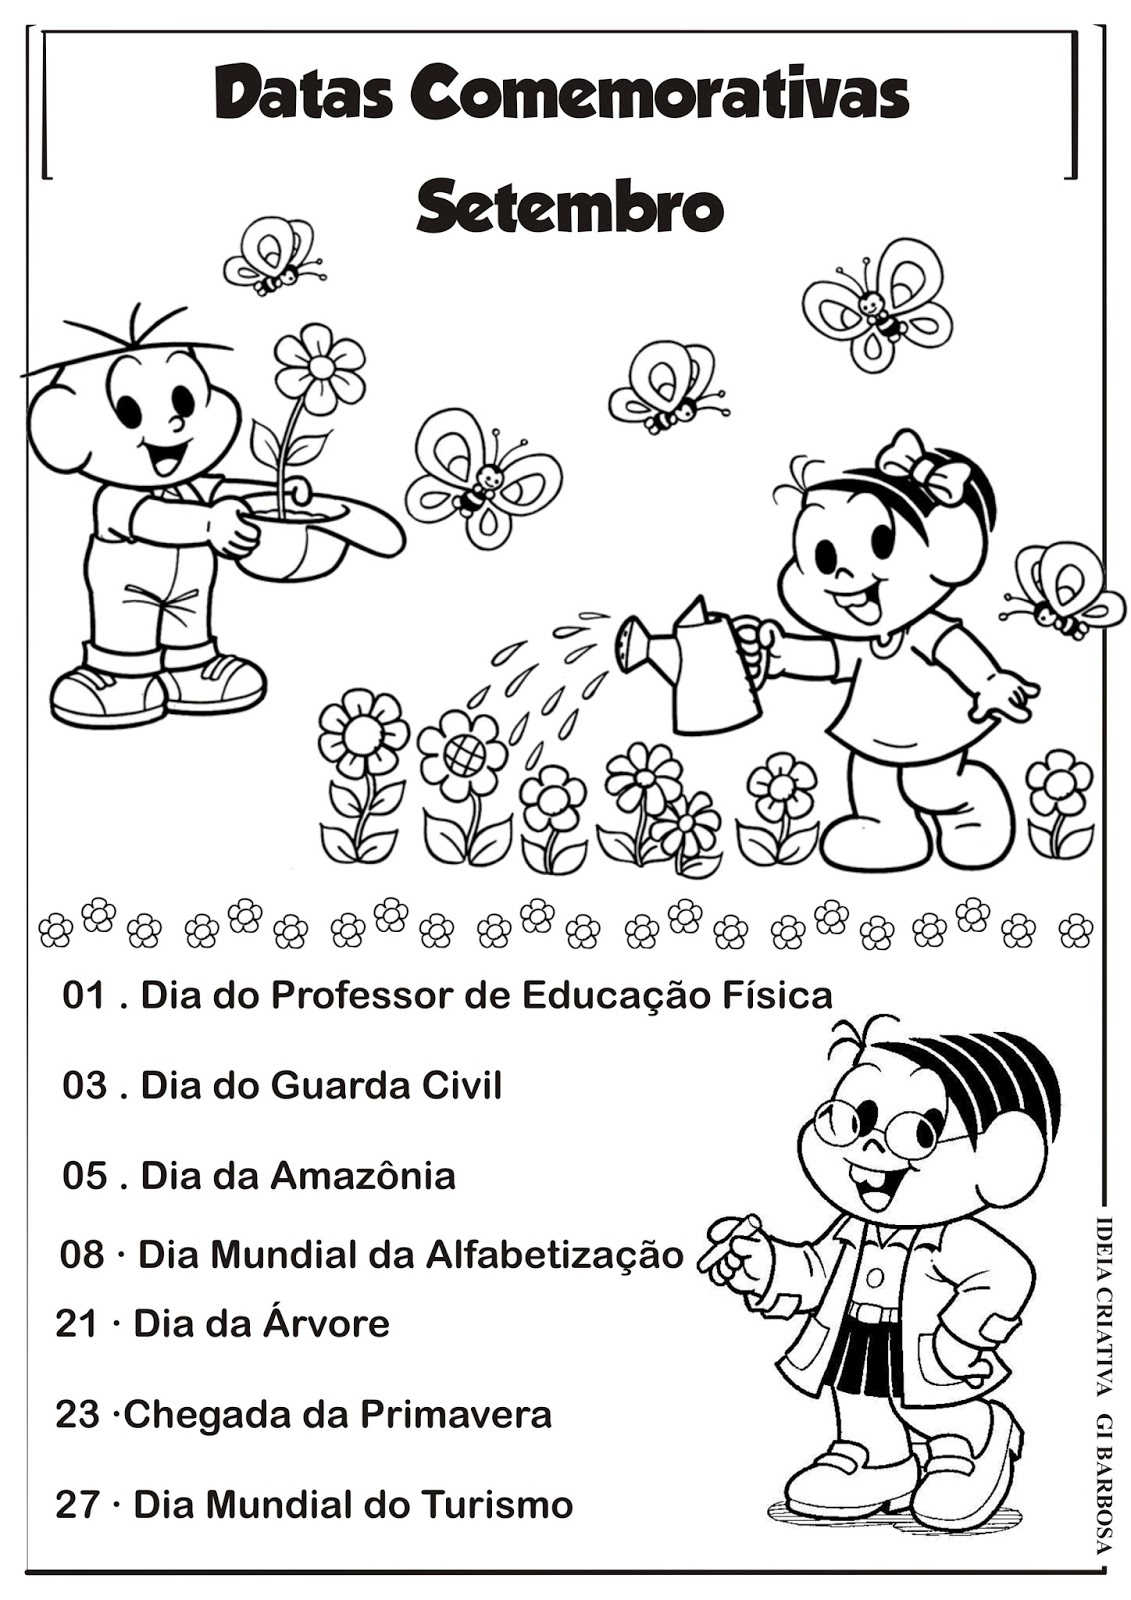 Top Datas Comemorativas de Setembro Arquivo Ilustrado | Ideia Criativa  IG49